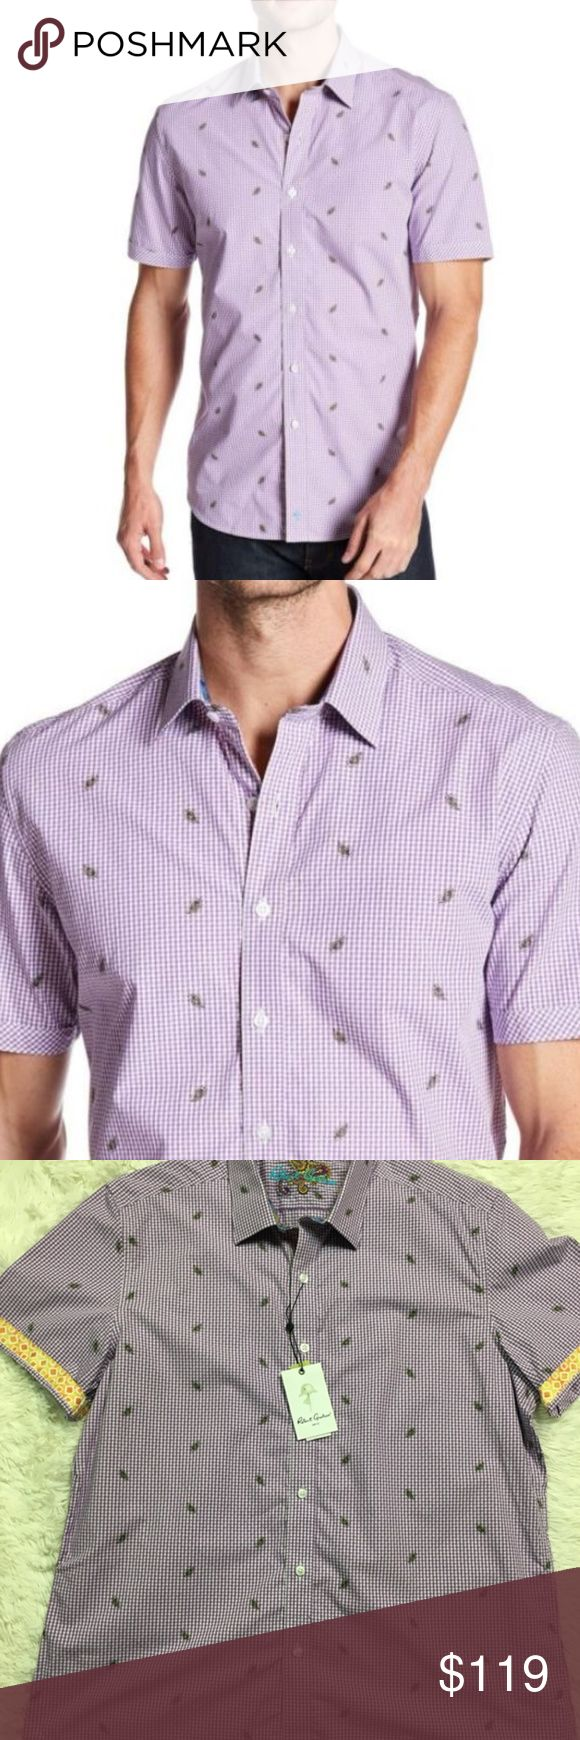 Robert Graham Mens Shirt XL Checkered Plaid White Robert Graham Mens Shirt XL Checkered & Plaid White Sea & Purple New NWT XL Total length is 32 inches, unstretched.  Chest is 52 inches unstretched Robert Graham Shirts Casual Button Down Shirts